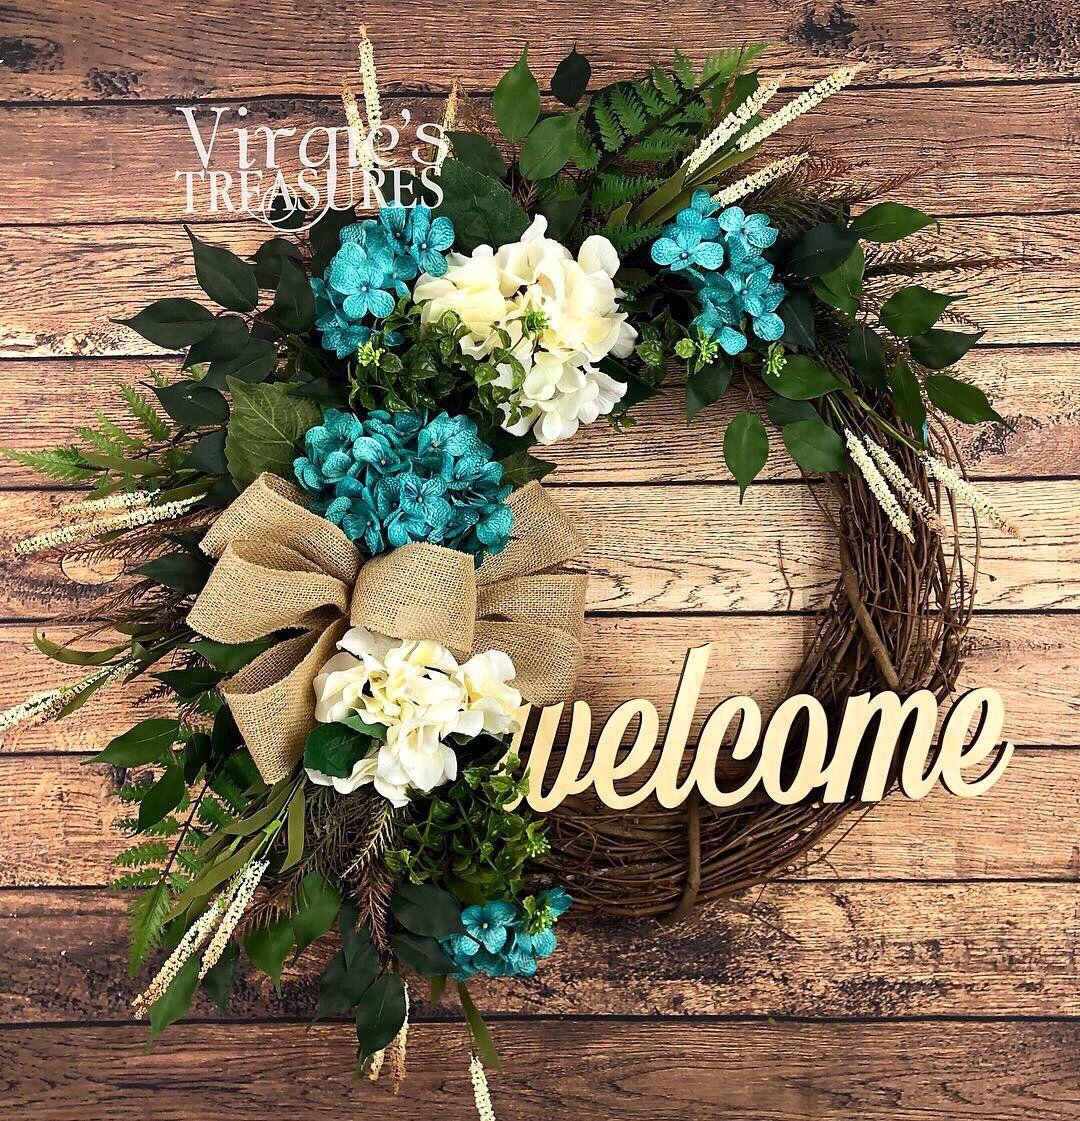 Photo of Premium Hydrangea Wreath, Blue and Cream Hydrangea Wreath, Summer Grapevine Wreath, Spring Wreath, Welcome Wreath, Front Door Wreath